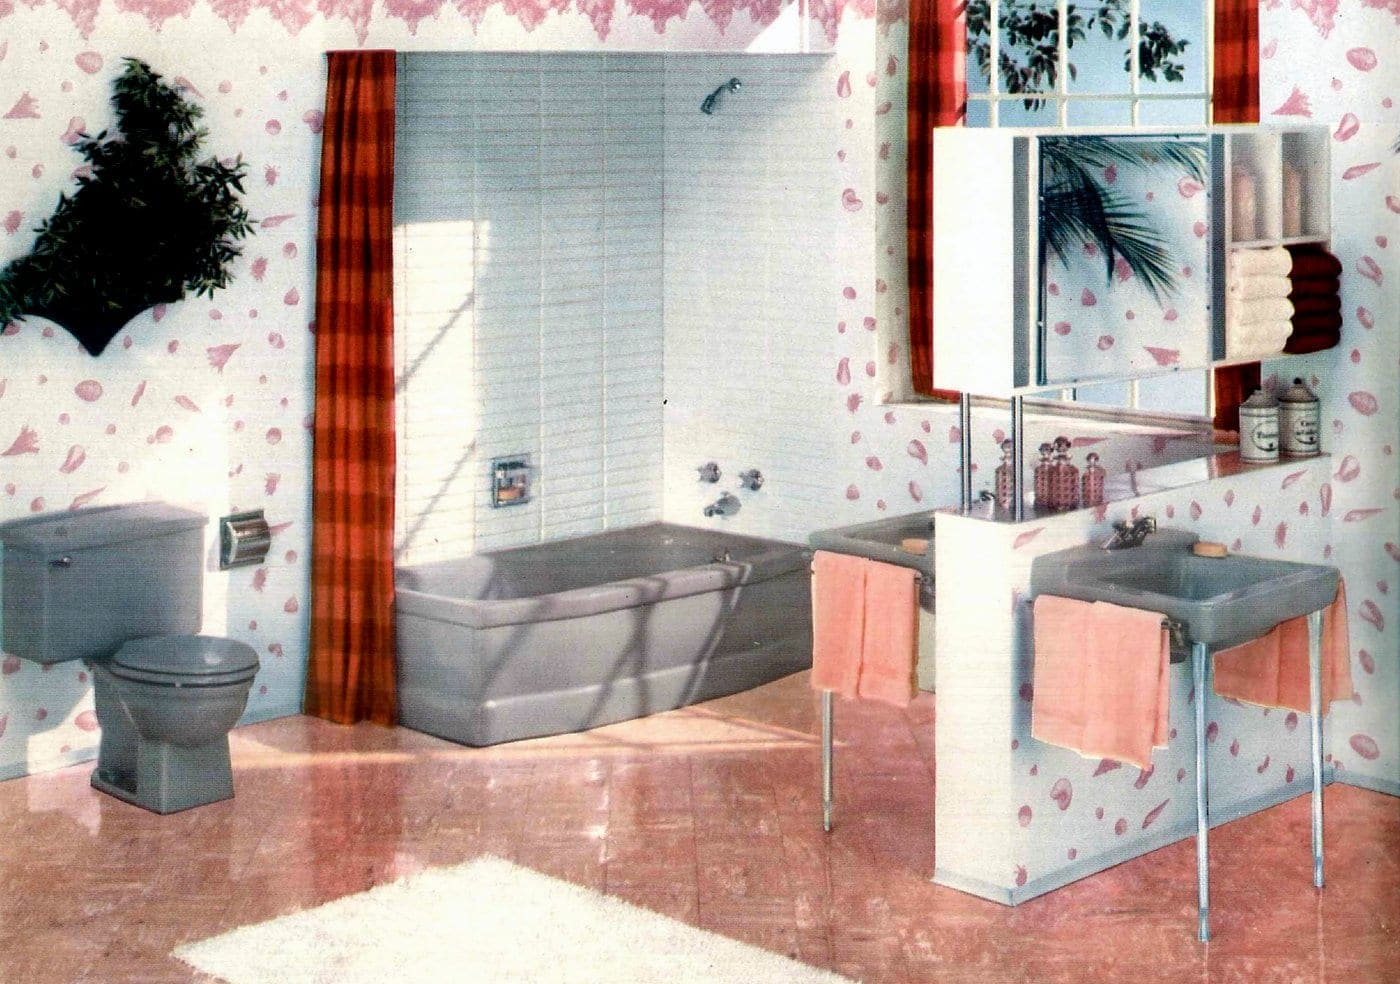 Sixties bathroom decorating ideas - 1960 (1)